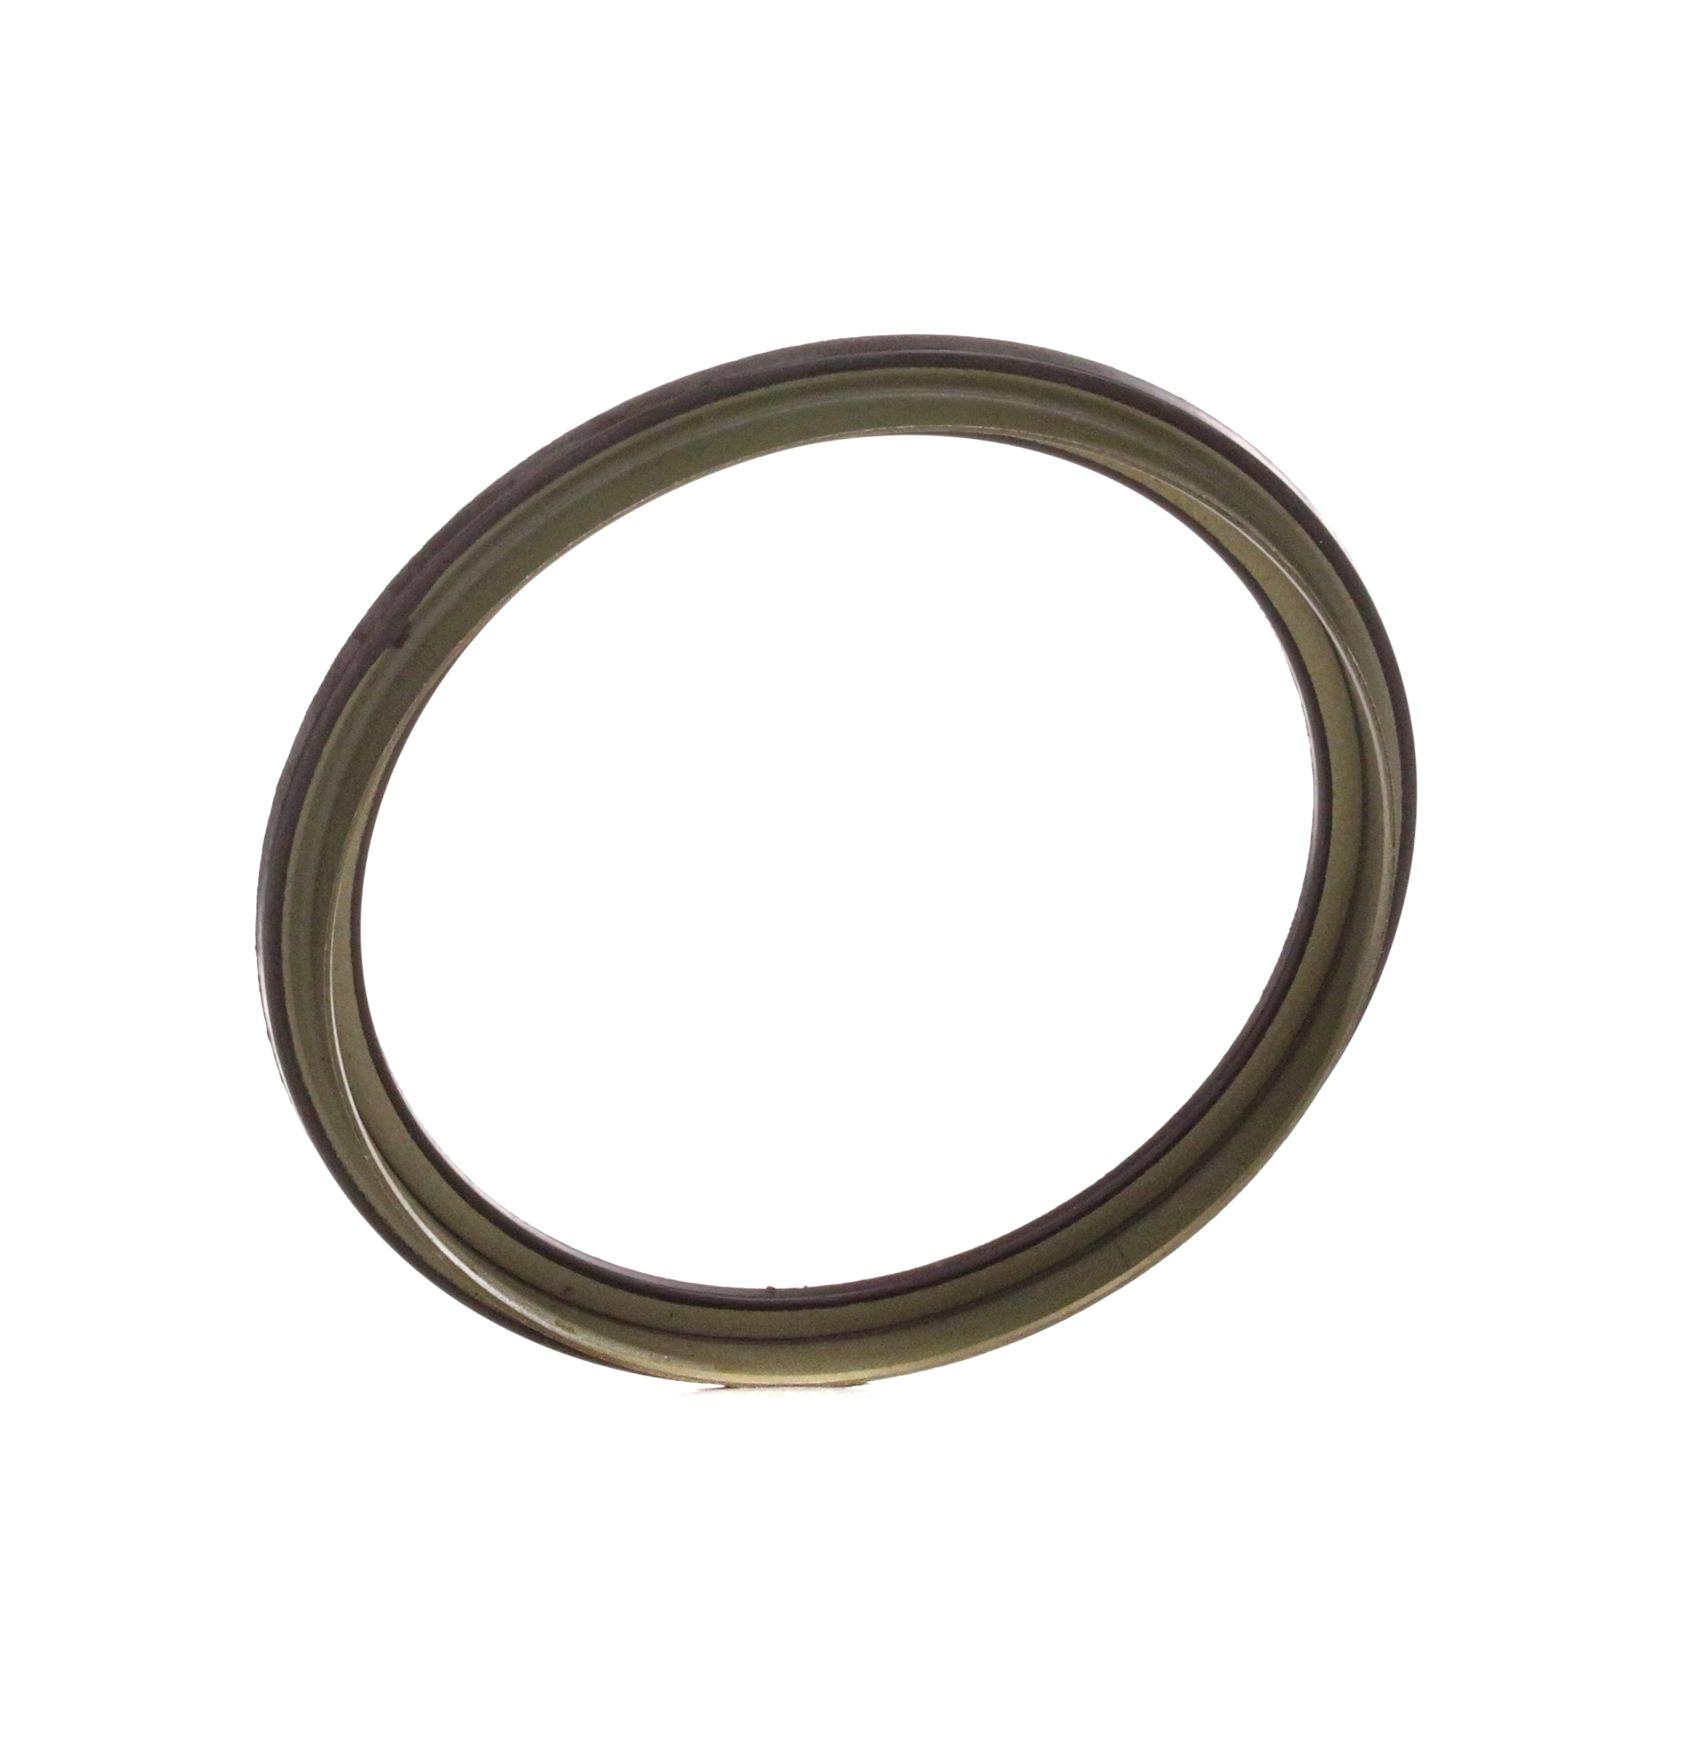 ABS Sensorring TRISCAN 8540 29412 Bewertung